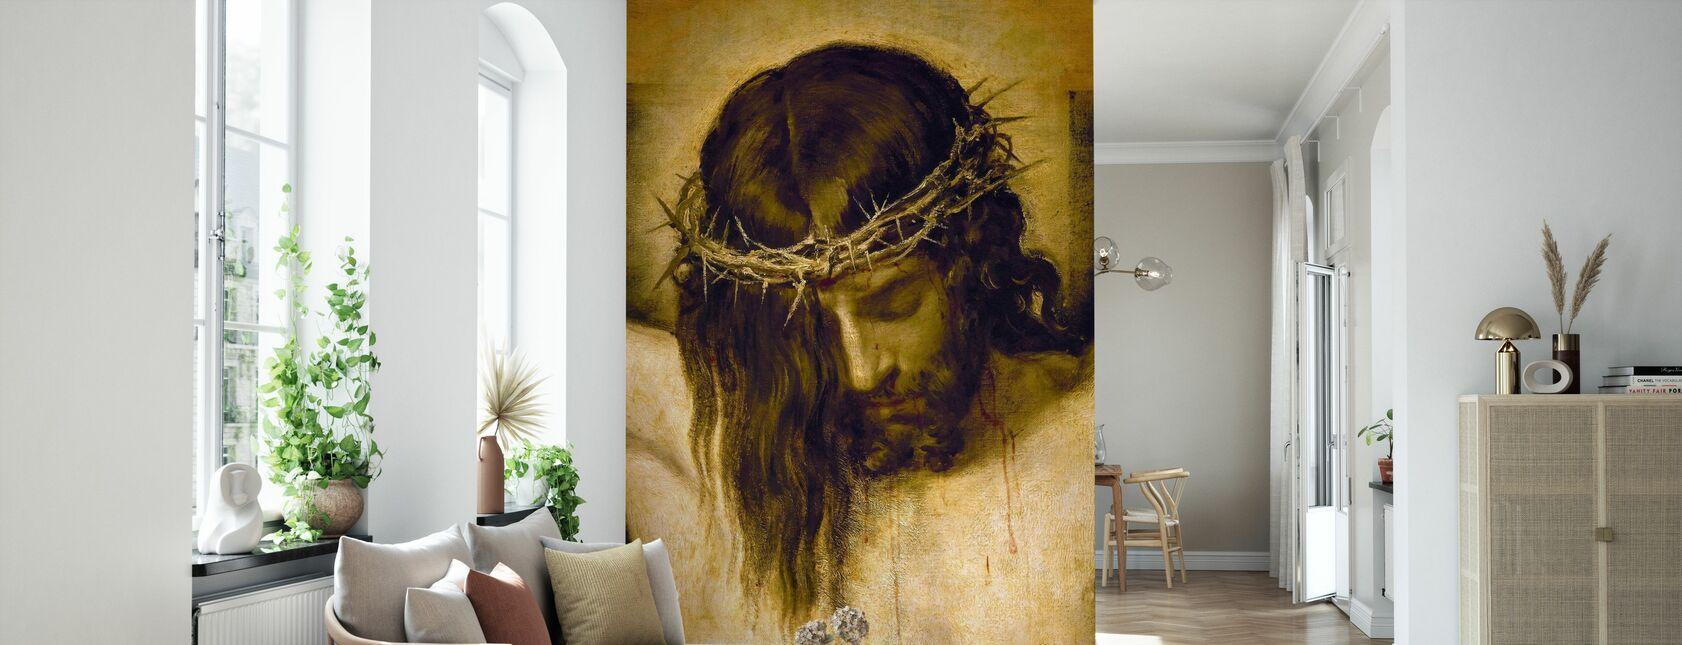 Korsfæstede Kristus - Tapet - Stue